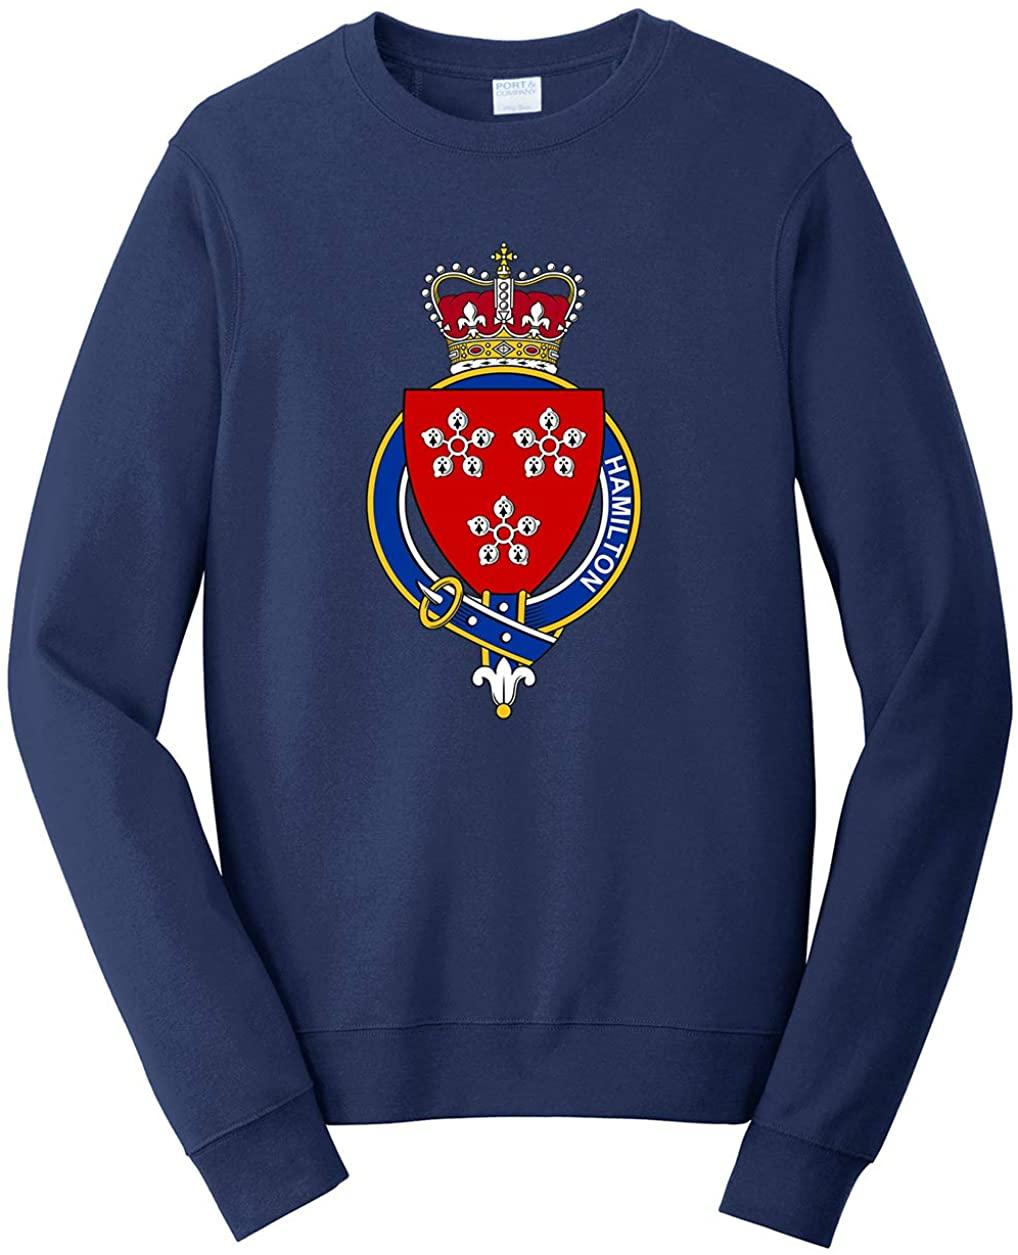 Tenacitee Unisex Scottish Garter Family Hamilton Sweatshirt